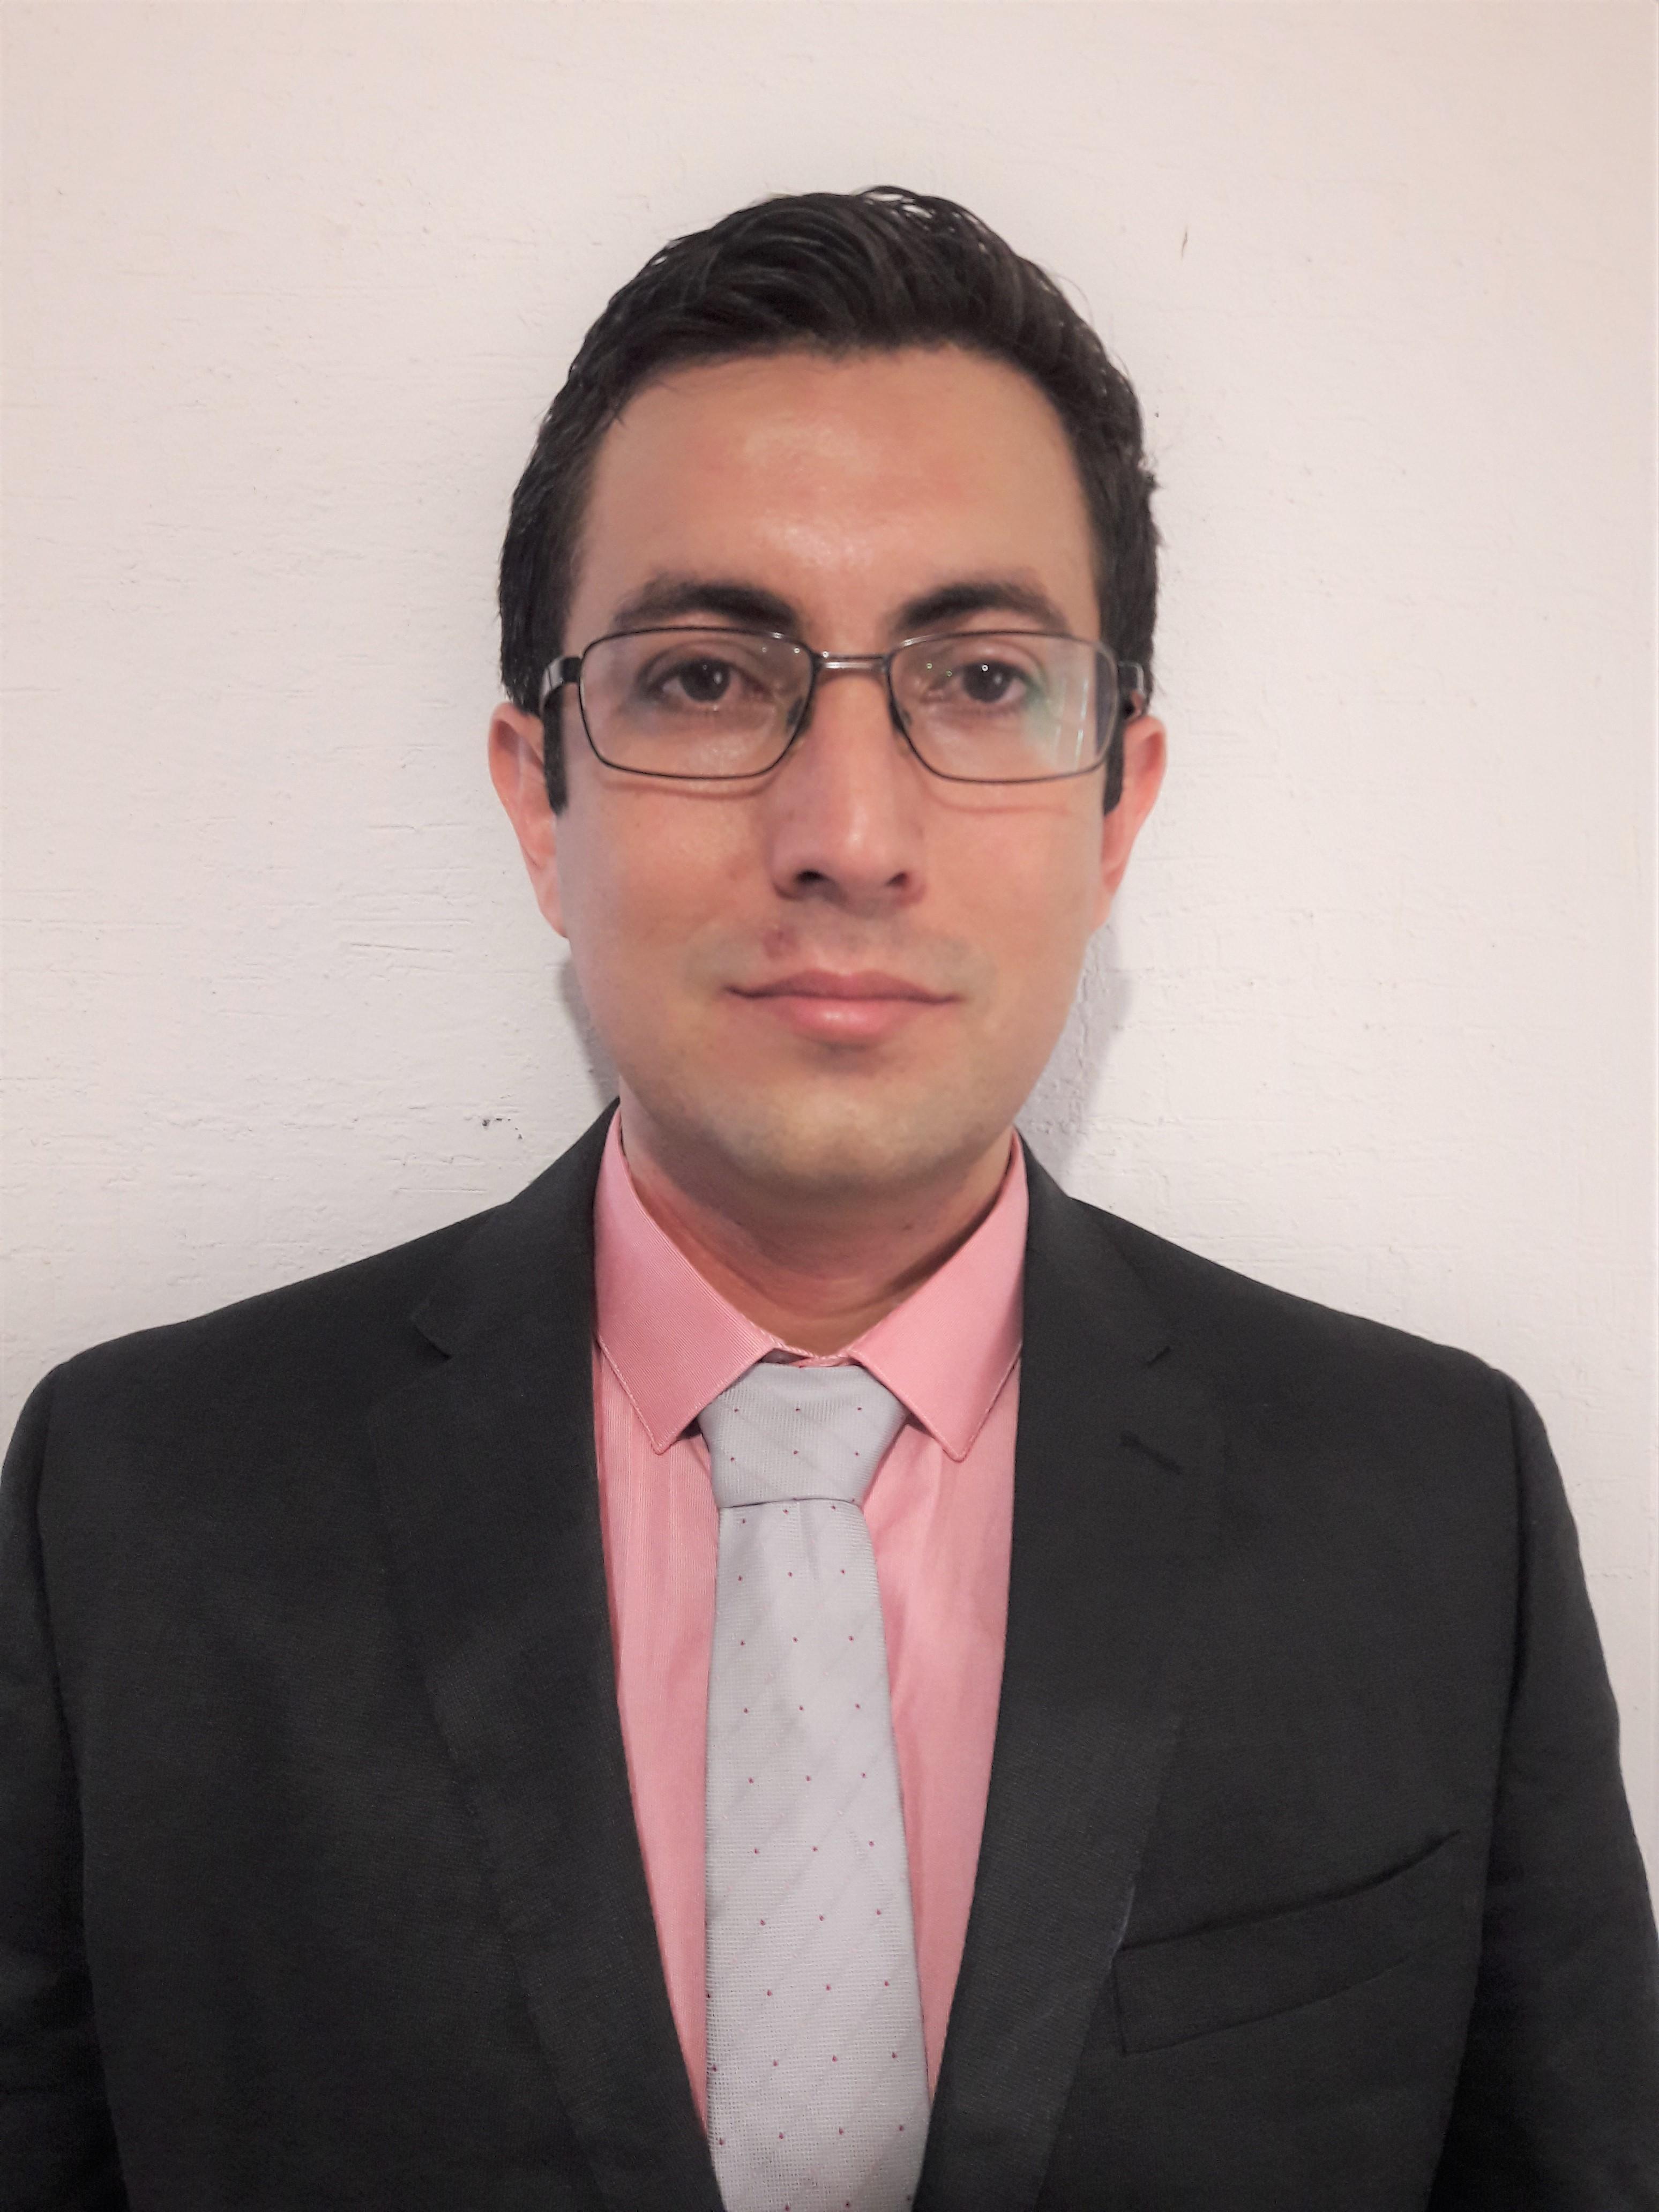 Luis Quesney